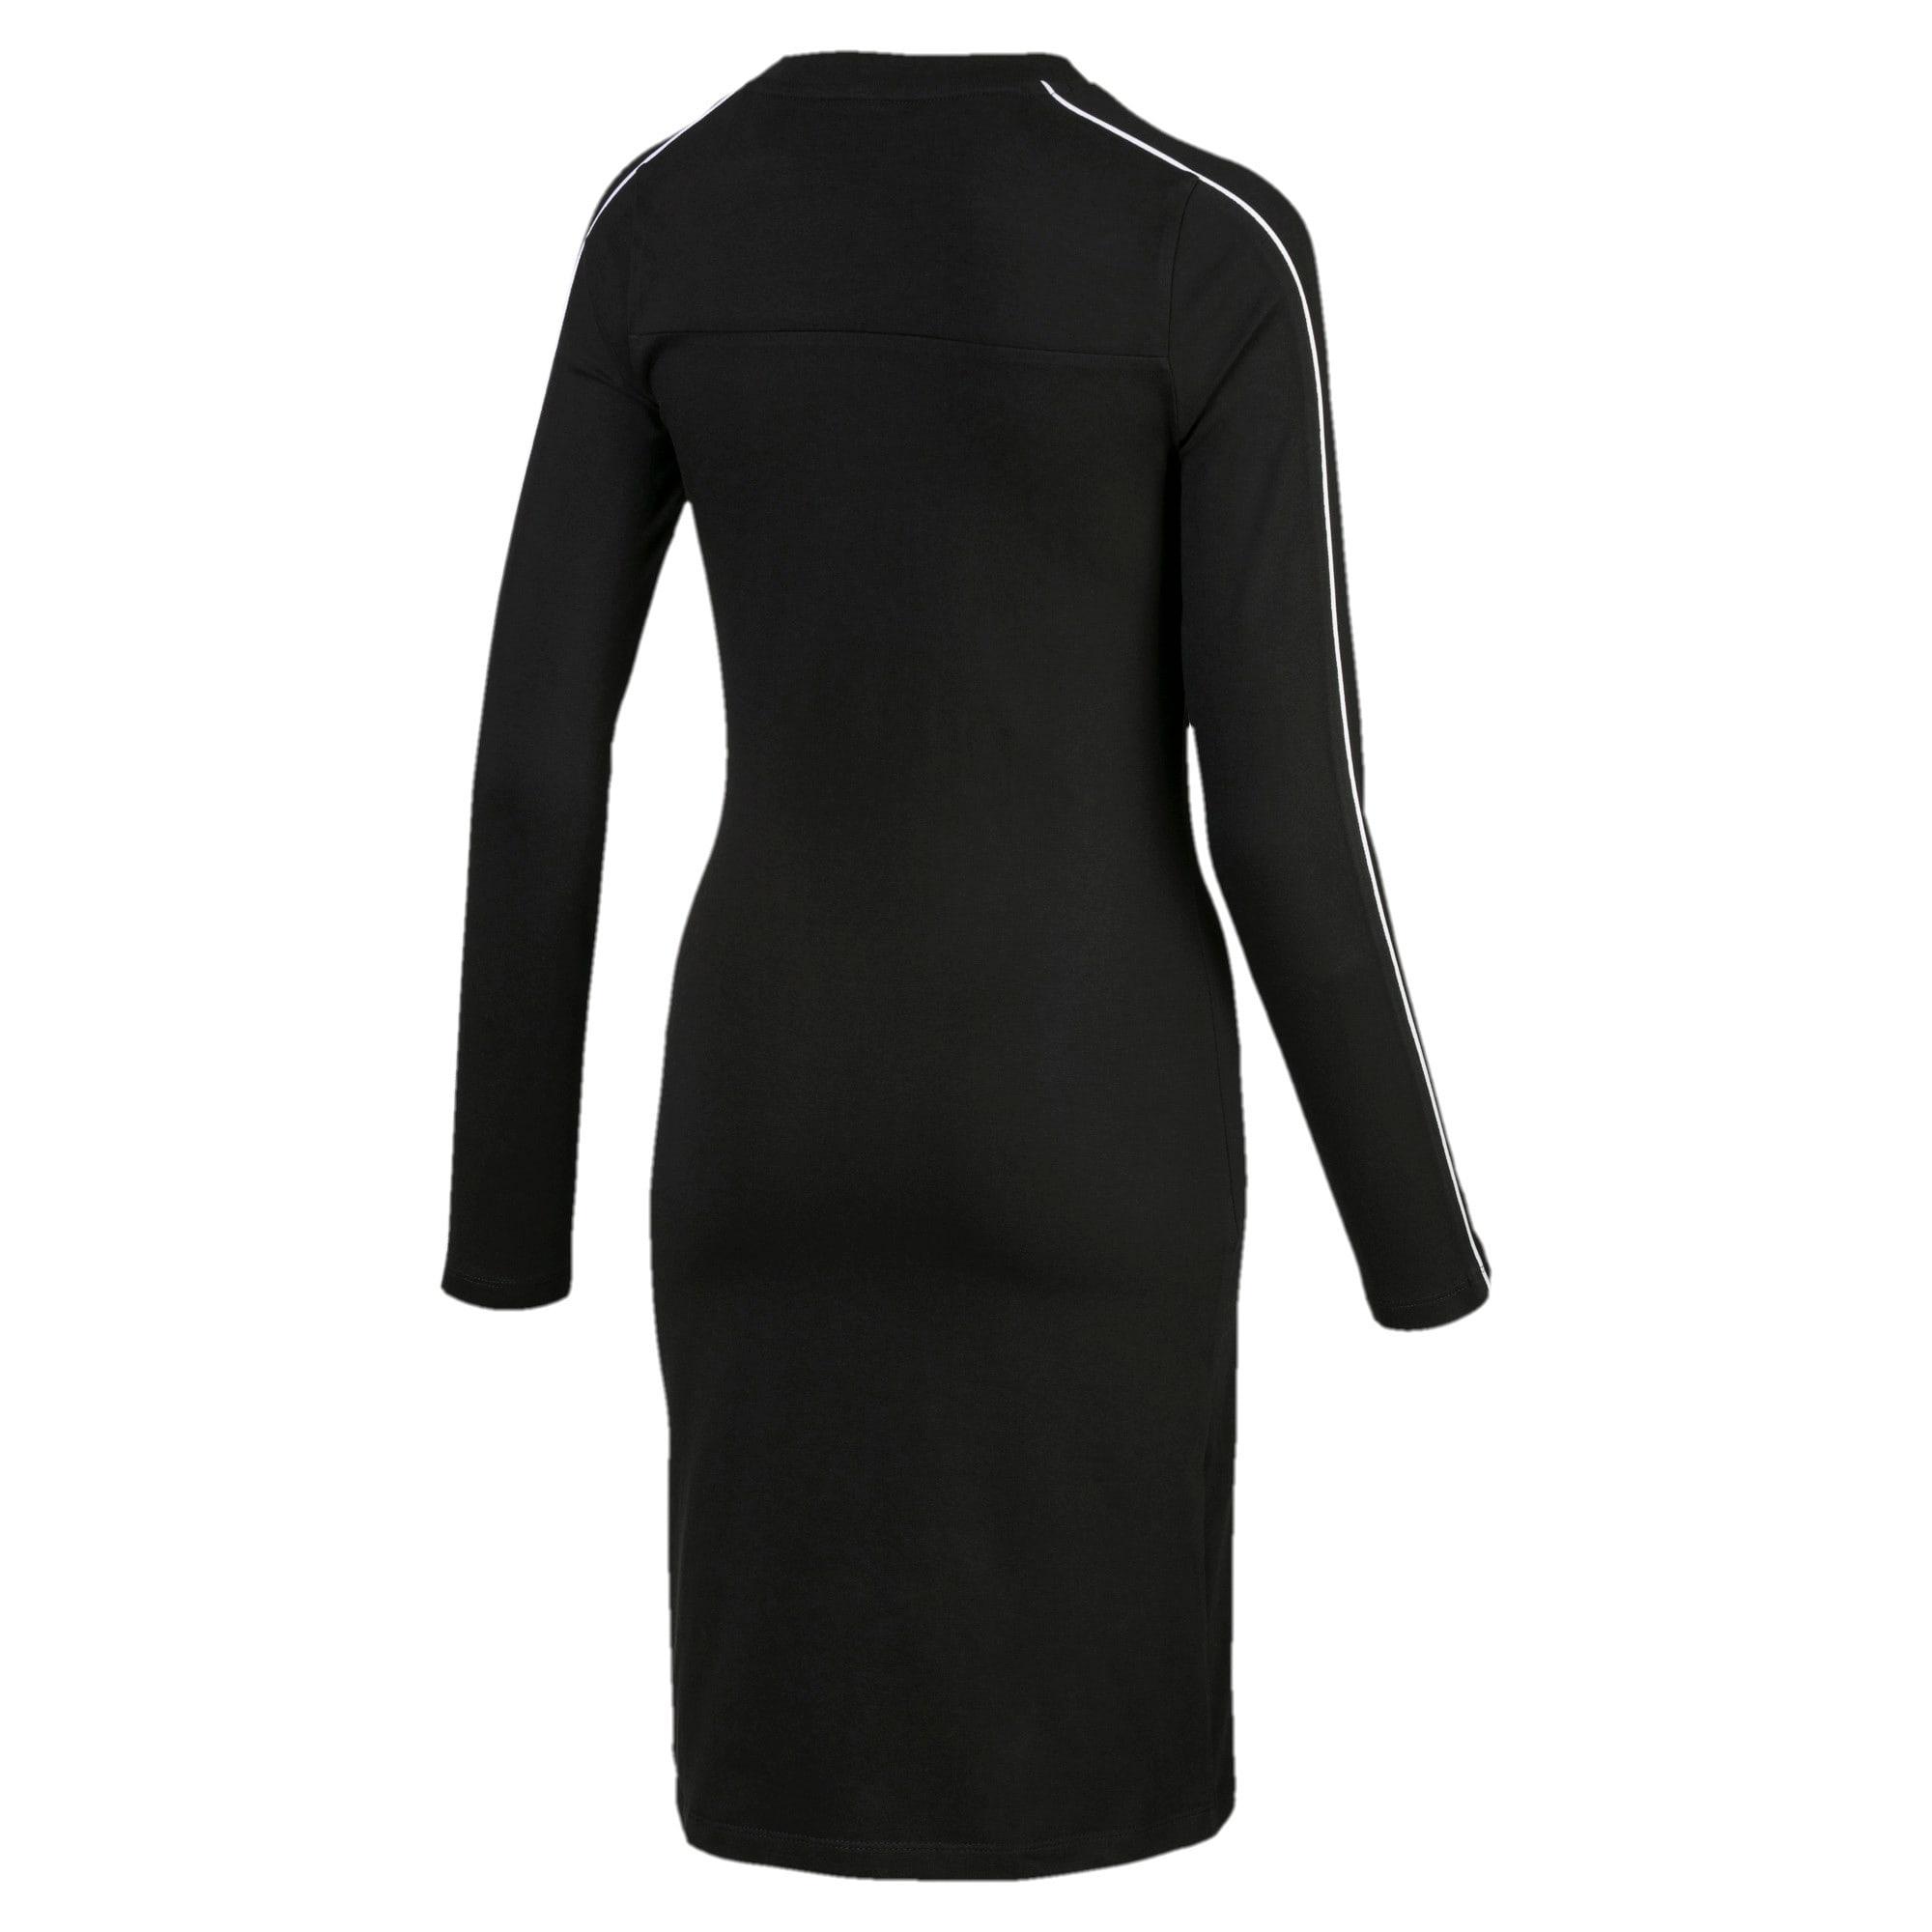 Thumbnail 5 van Classics jurk voor vrouwen, Puma Black, medium